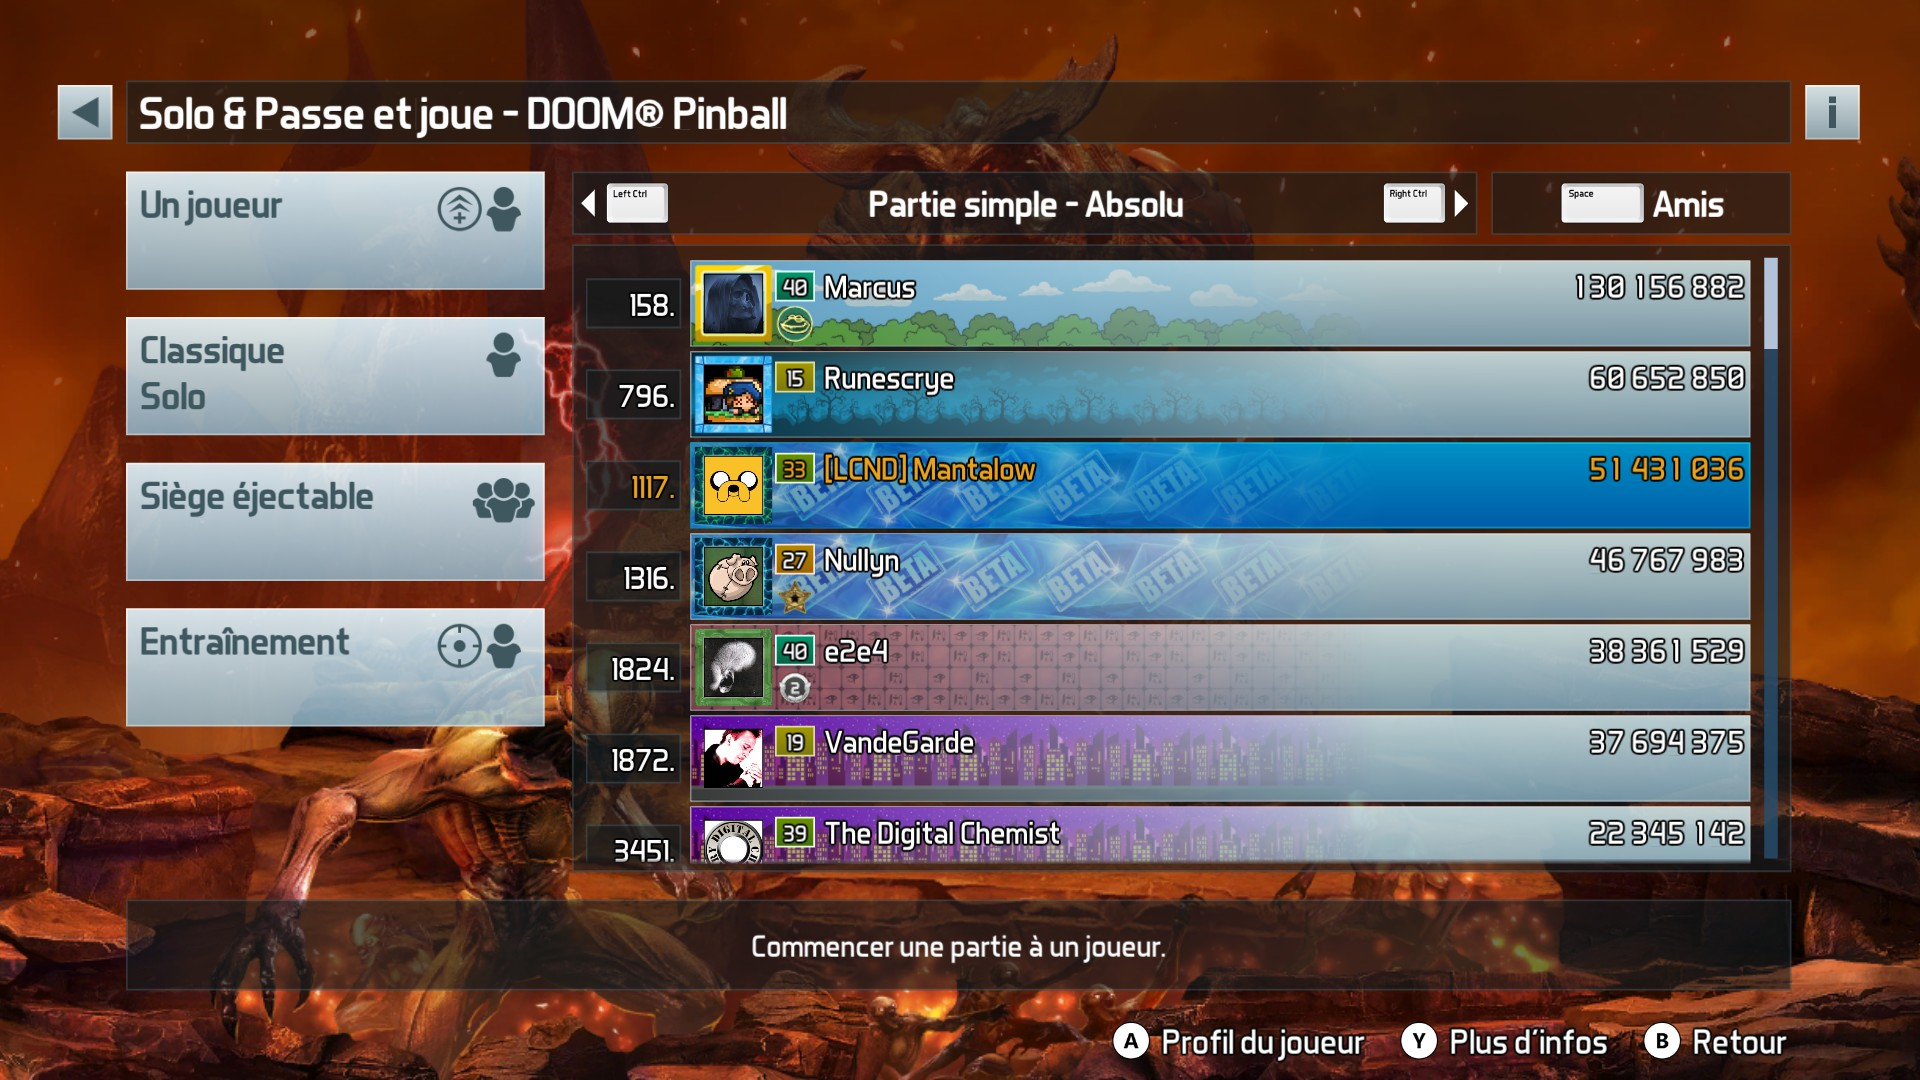 Mantalow: Pinball FX3: Doom Pinball (PC) 51,431,036 points on 2018-01-16 13:01:50